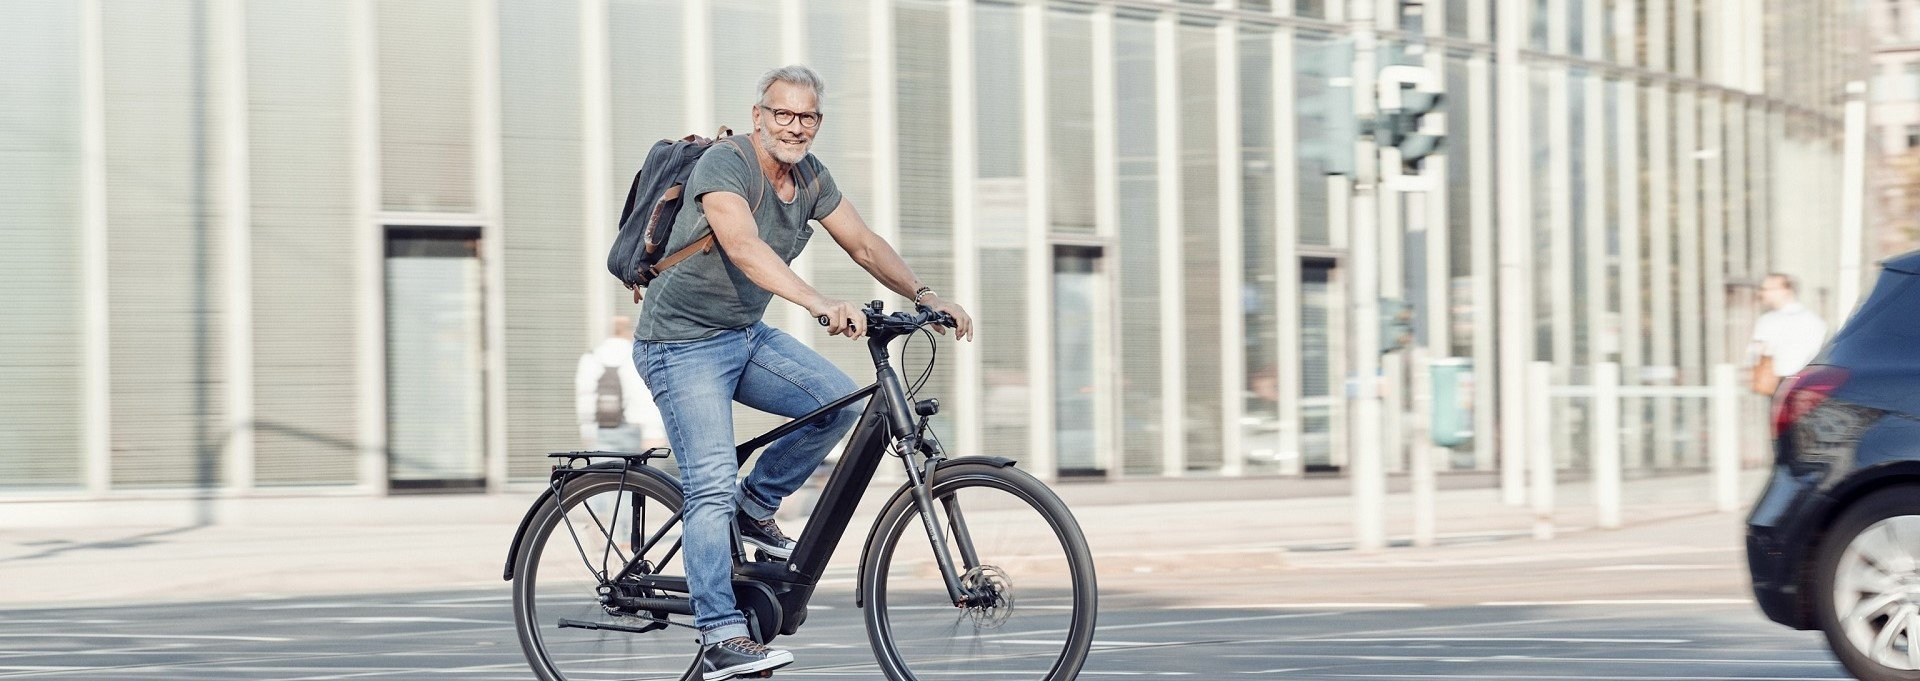 e bike blog von fahrrad xxl aktuelles zu e bikes pedelecs. Black Bedroom Furniture Sets. Home Design Ideas